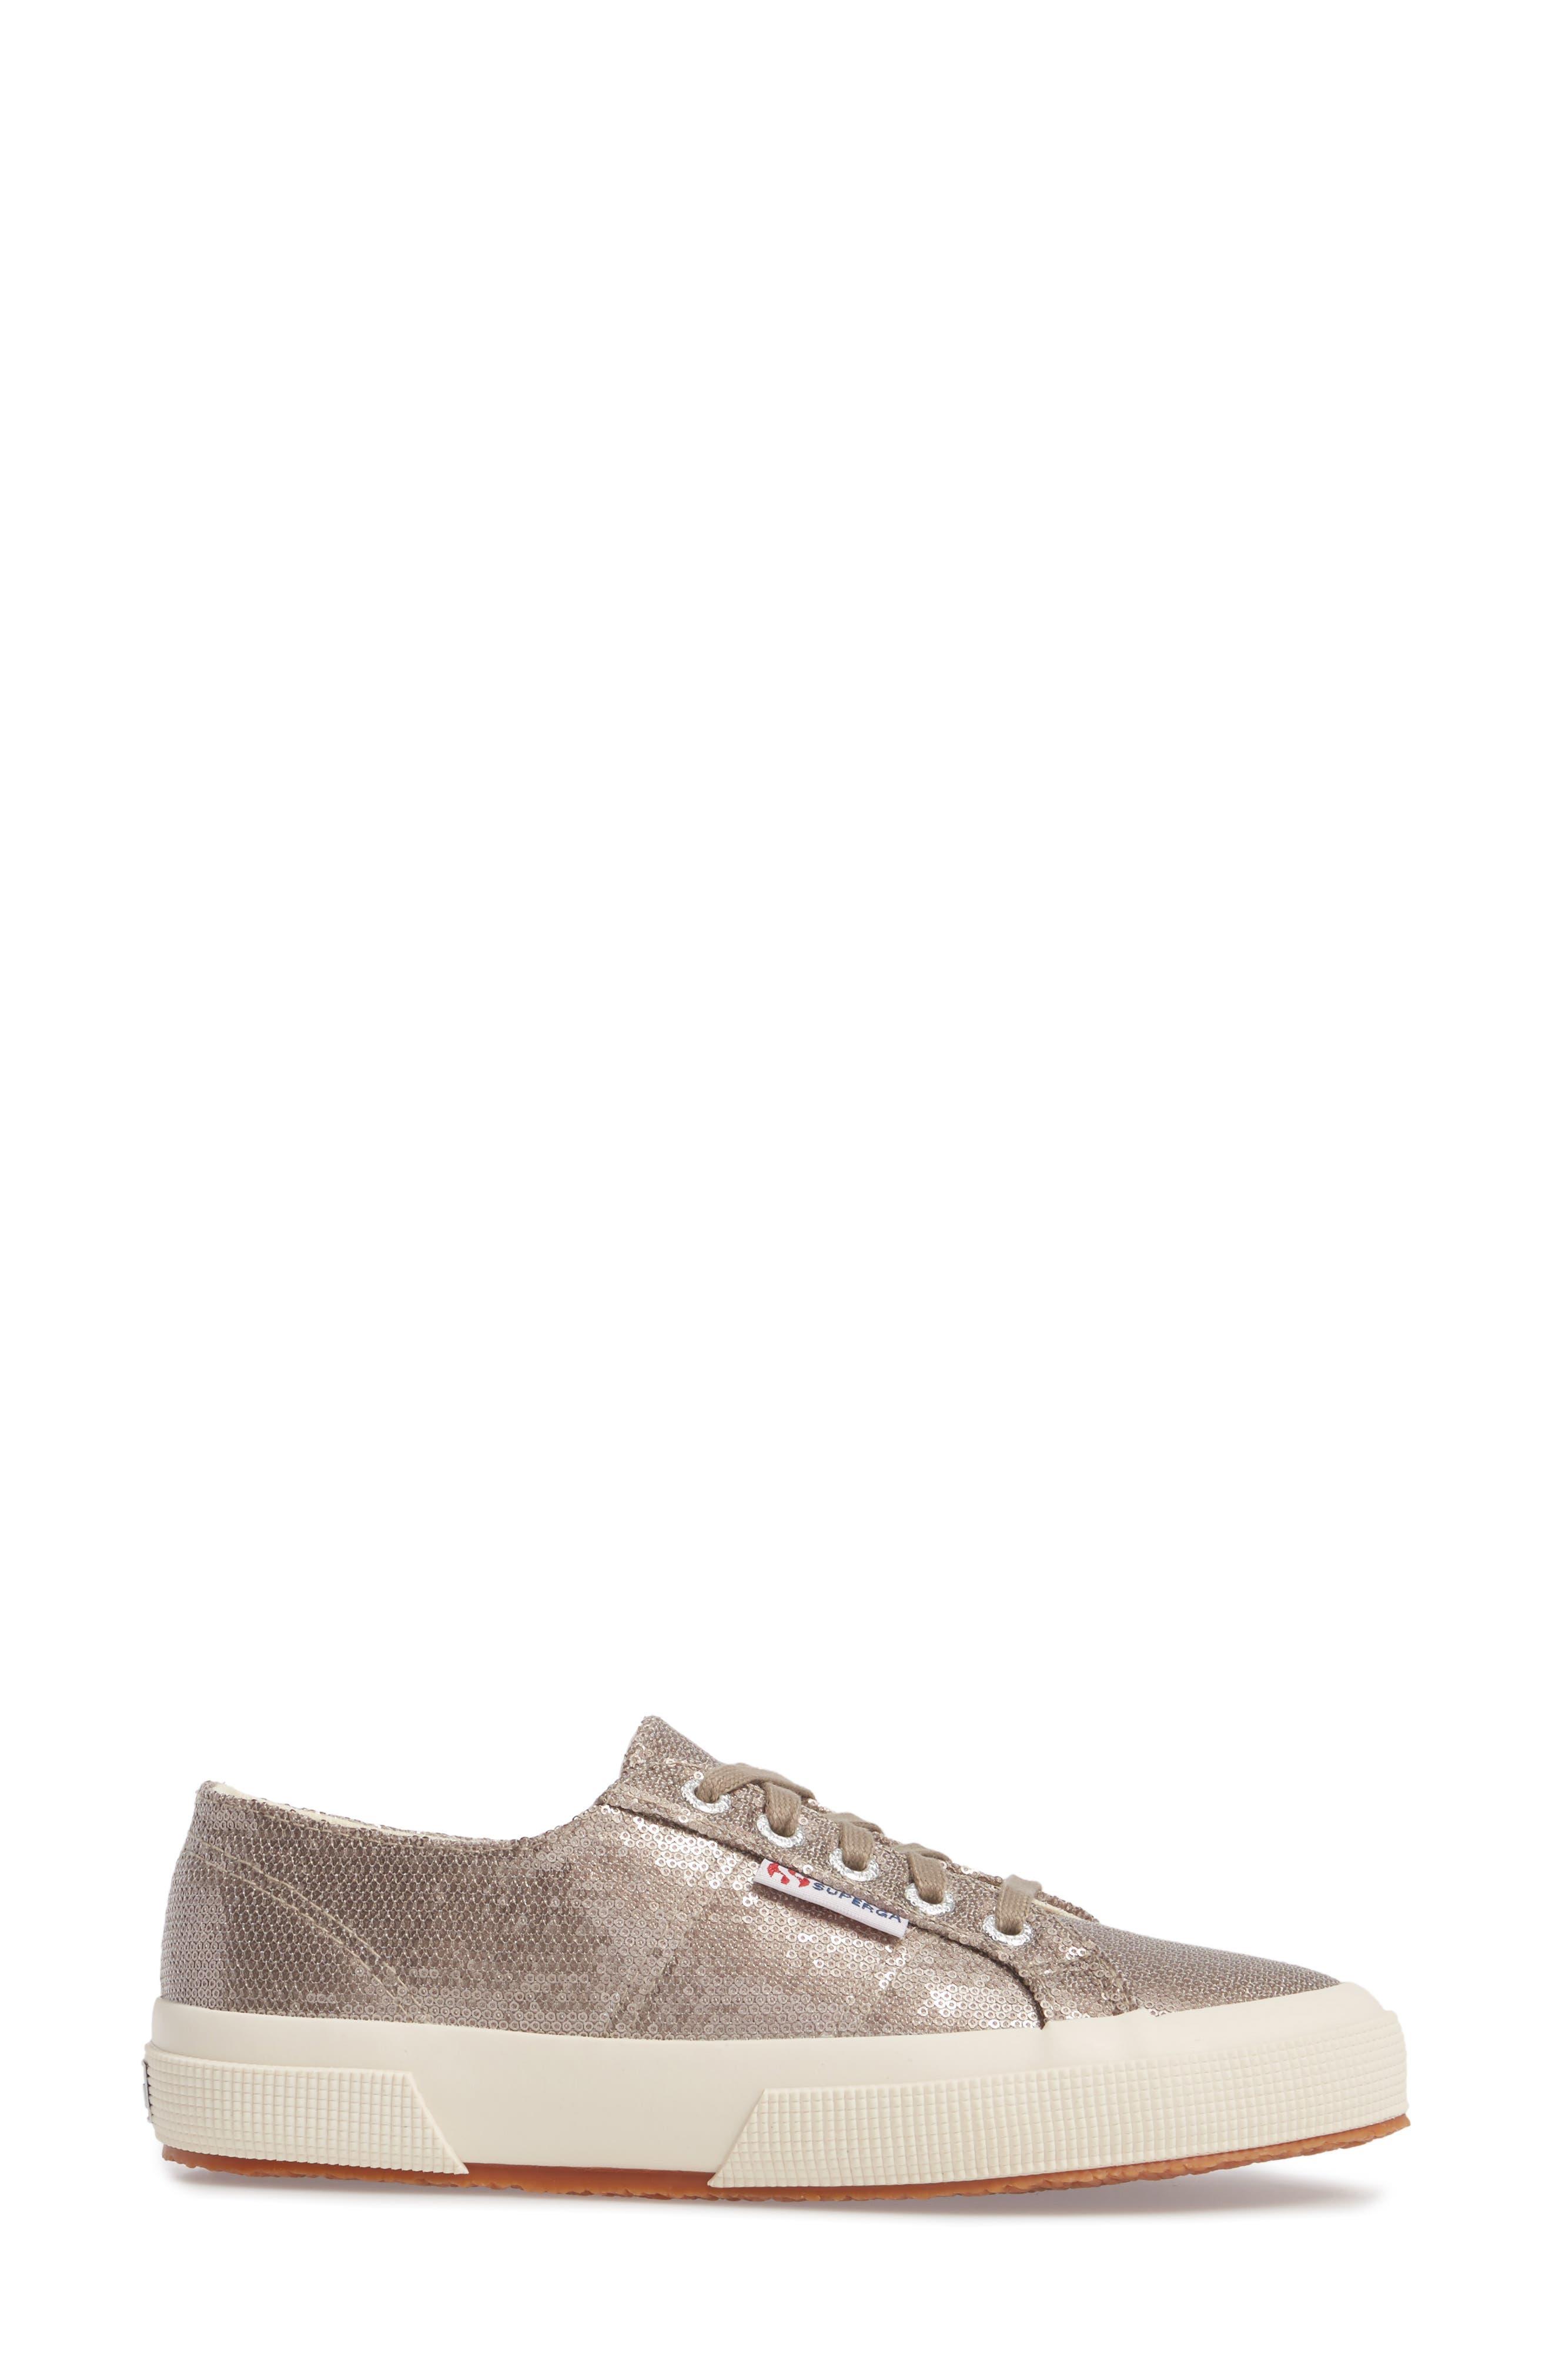 2750 Micro Sequin Sneaker,                             Alternate thumbnail 3, color,